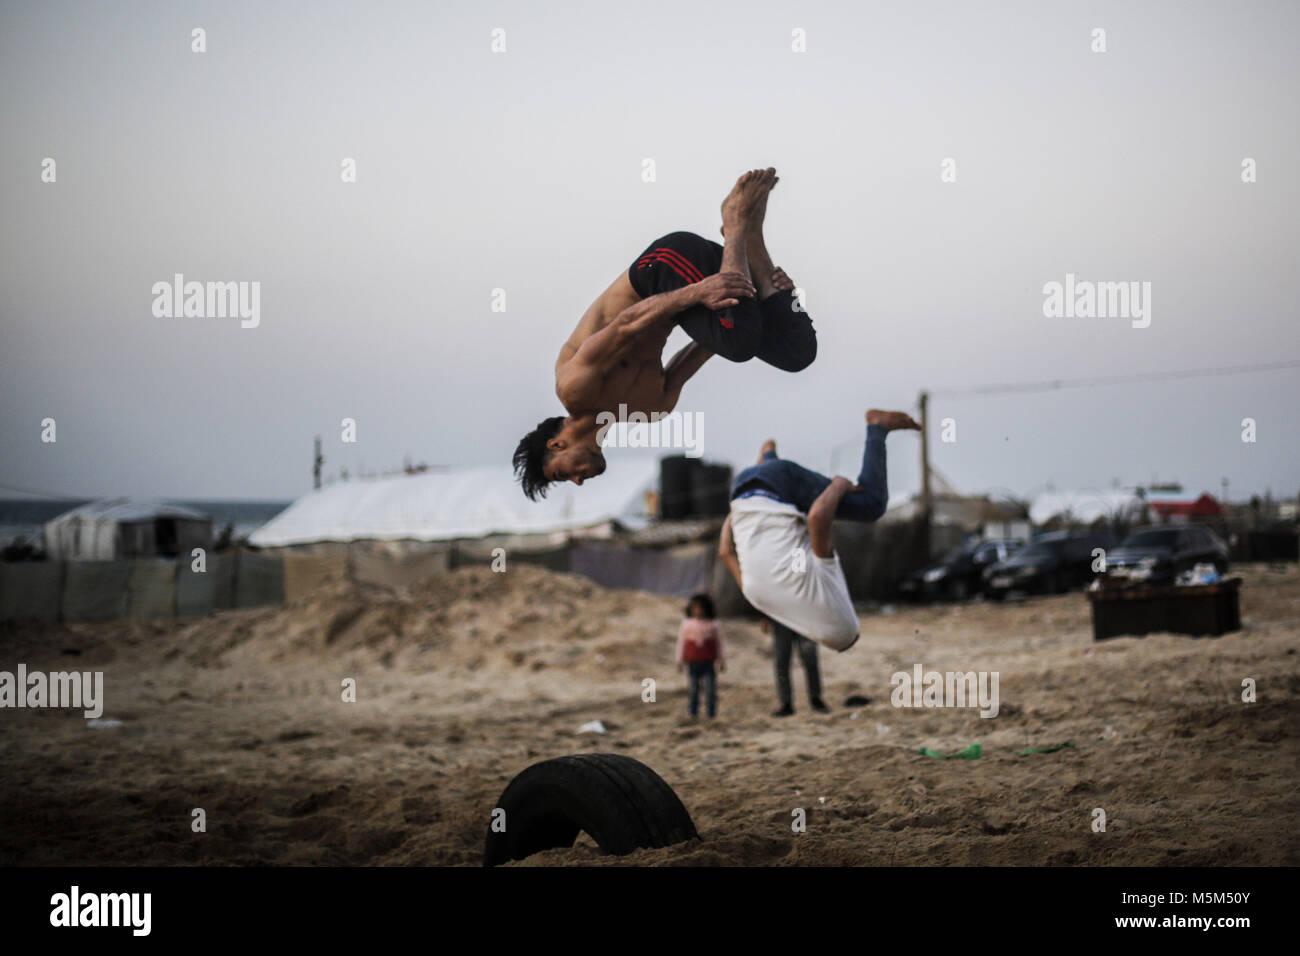 Gaza City, Gaza. 23rd Feb, 2018. Palestinian youth practice their parkour skills on the beach of Gaza City, Gaza, - Stock Image